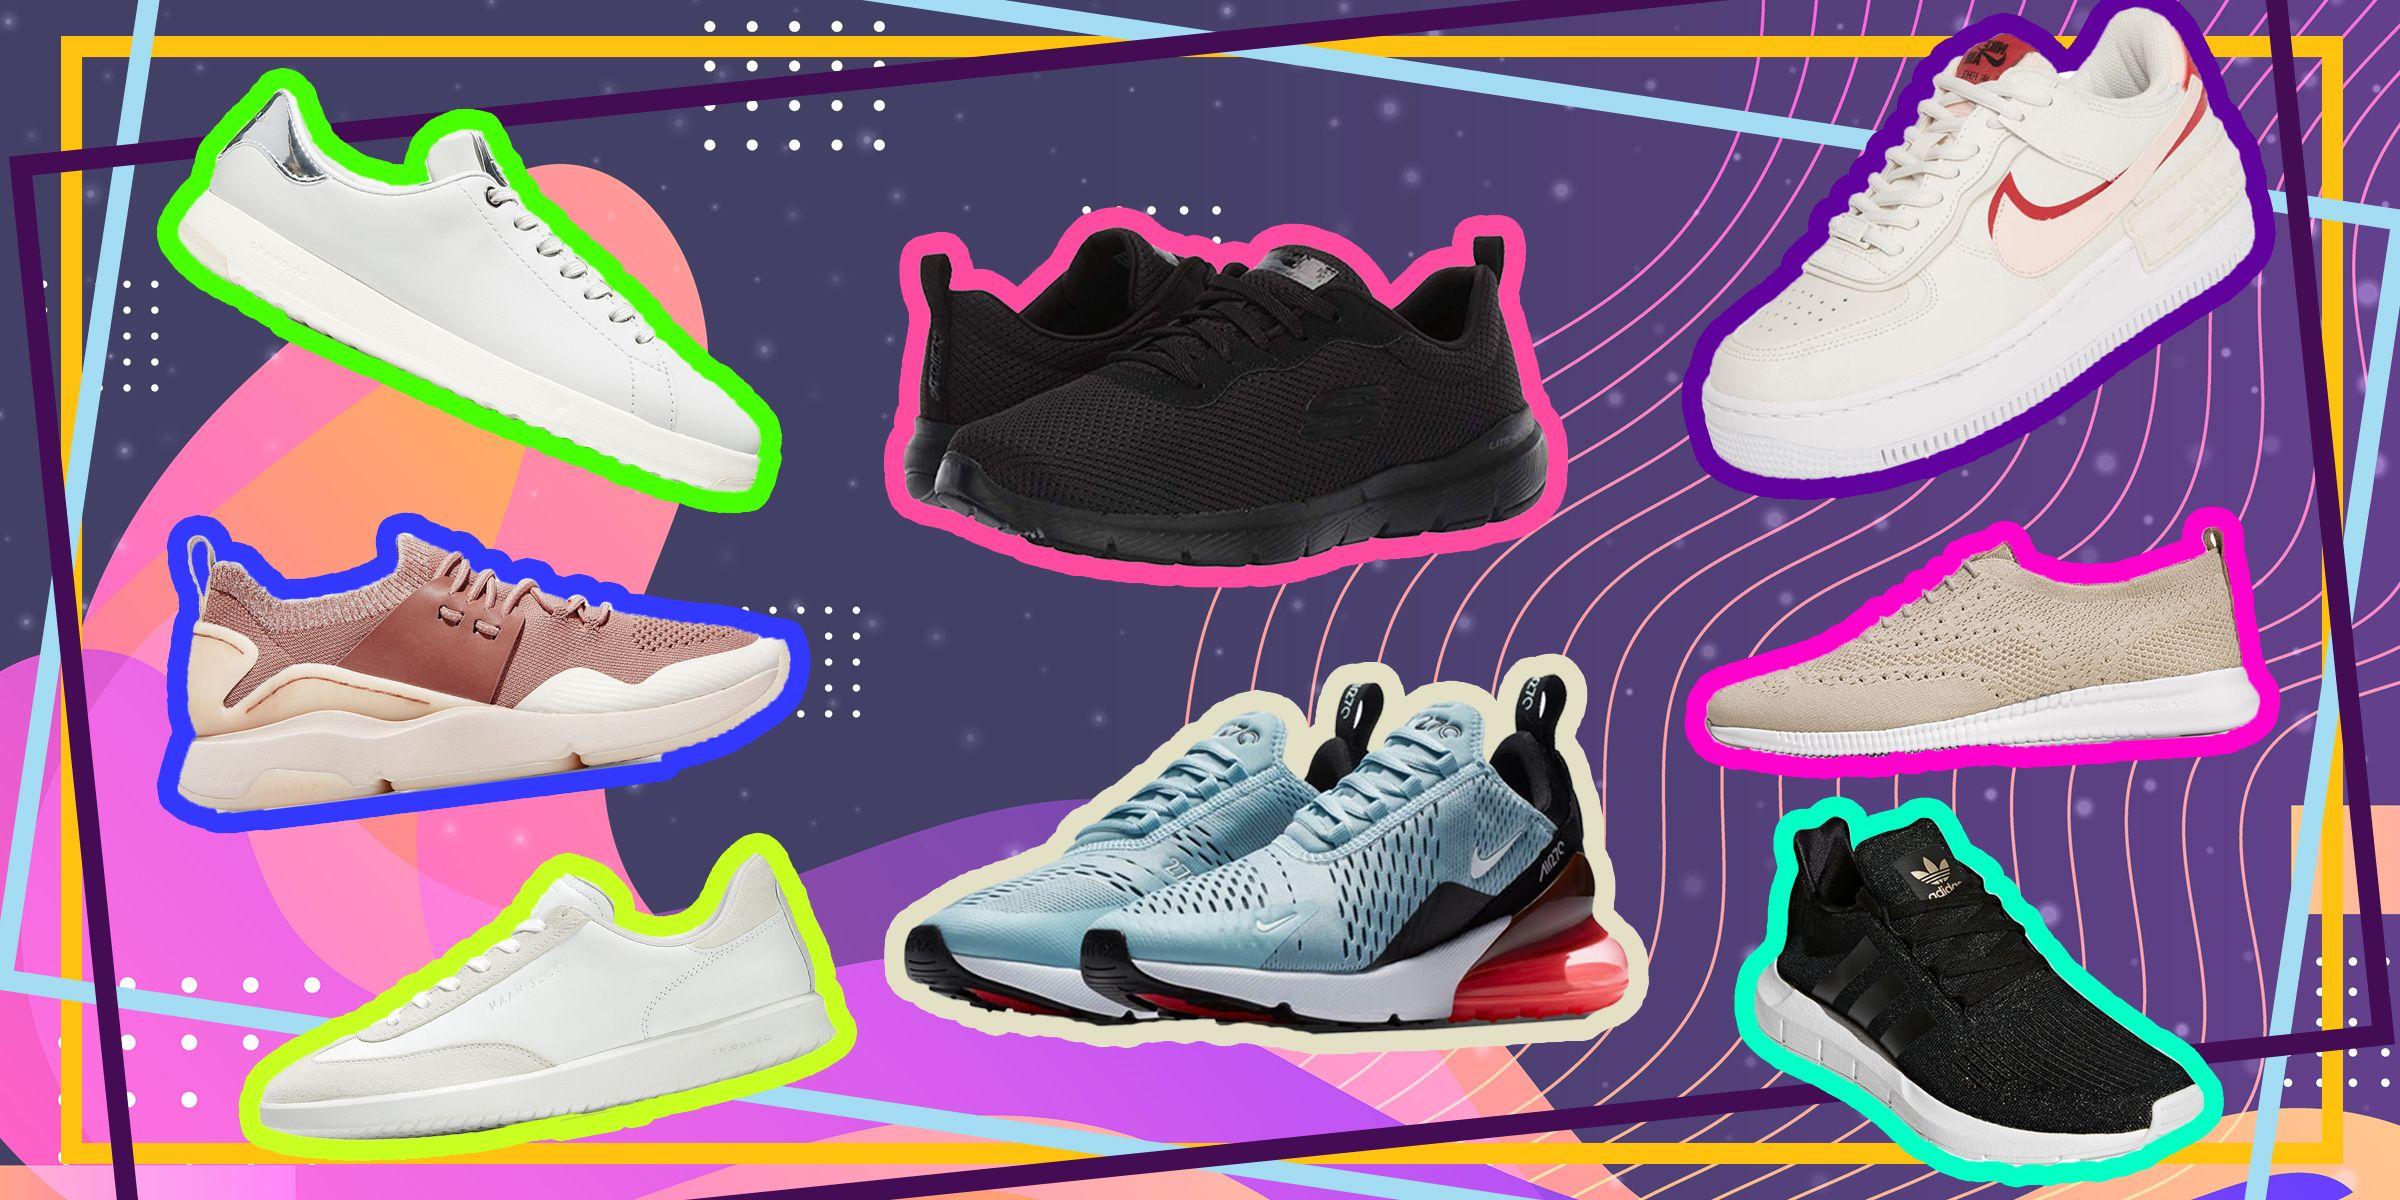 17 of the Best, Work-Friendly Sneakers